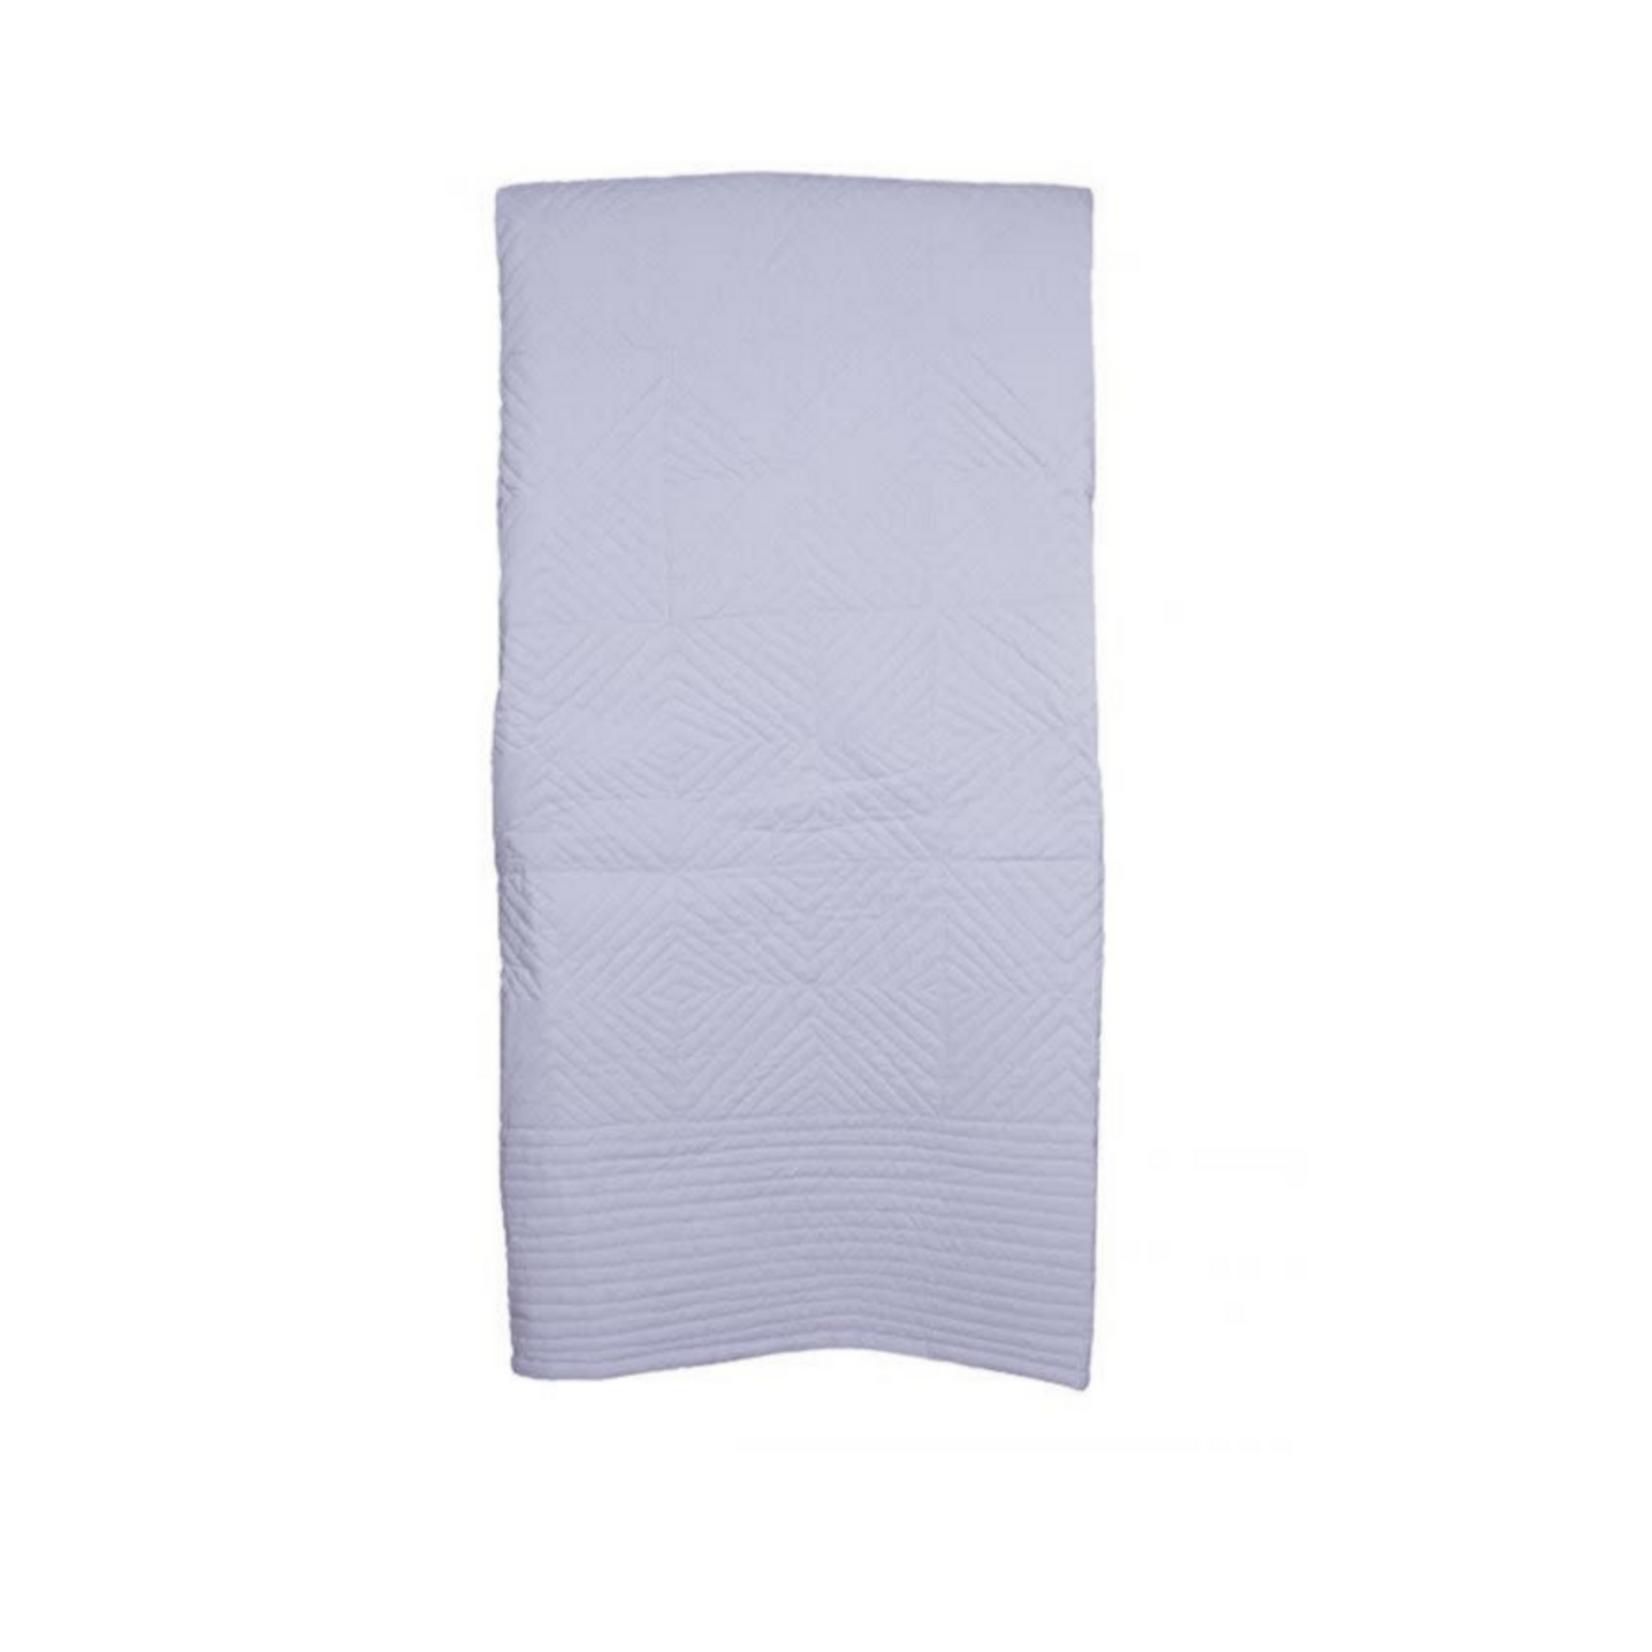 Wyld Blue Home White Applique Quilt